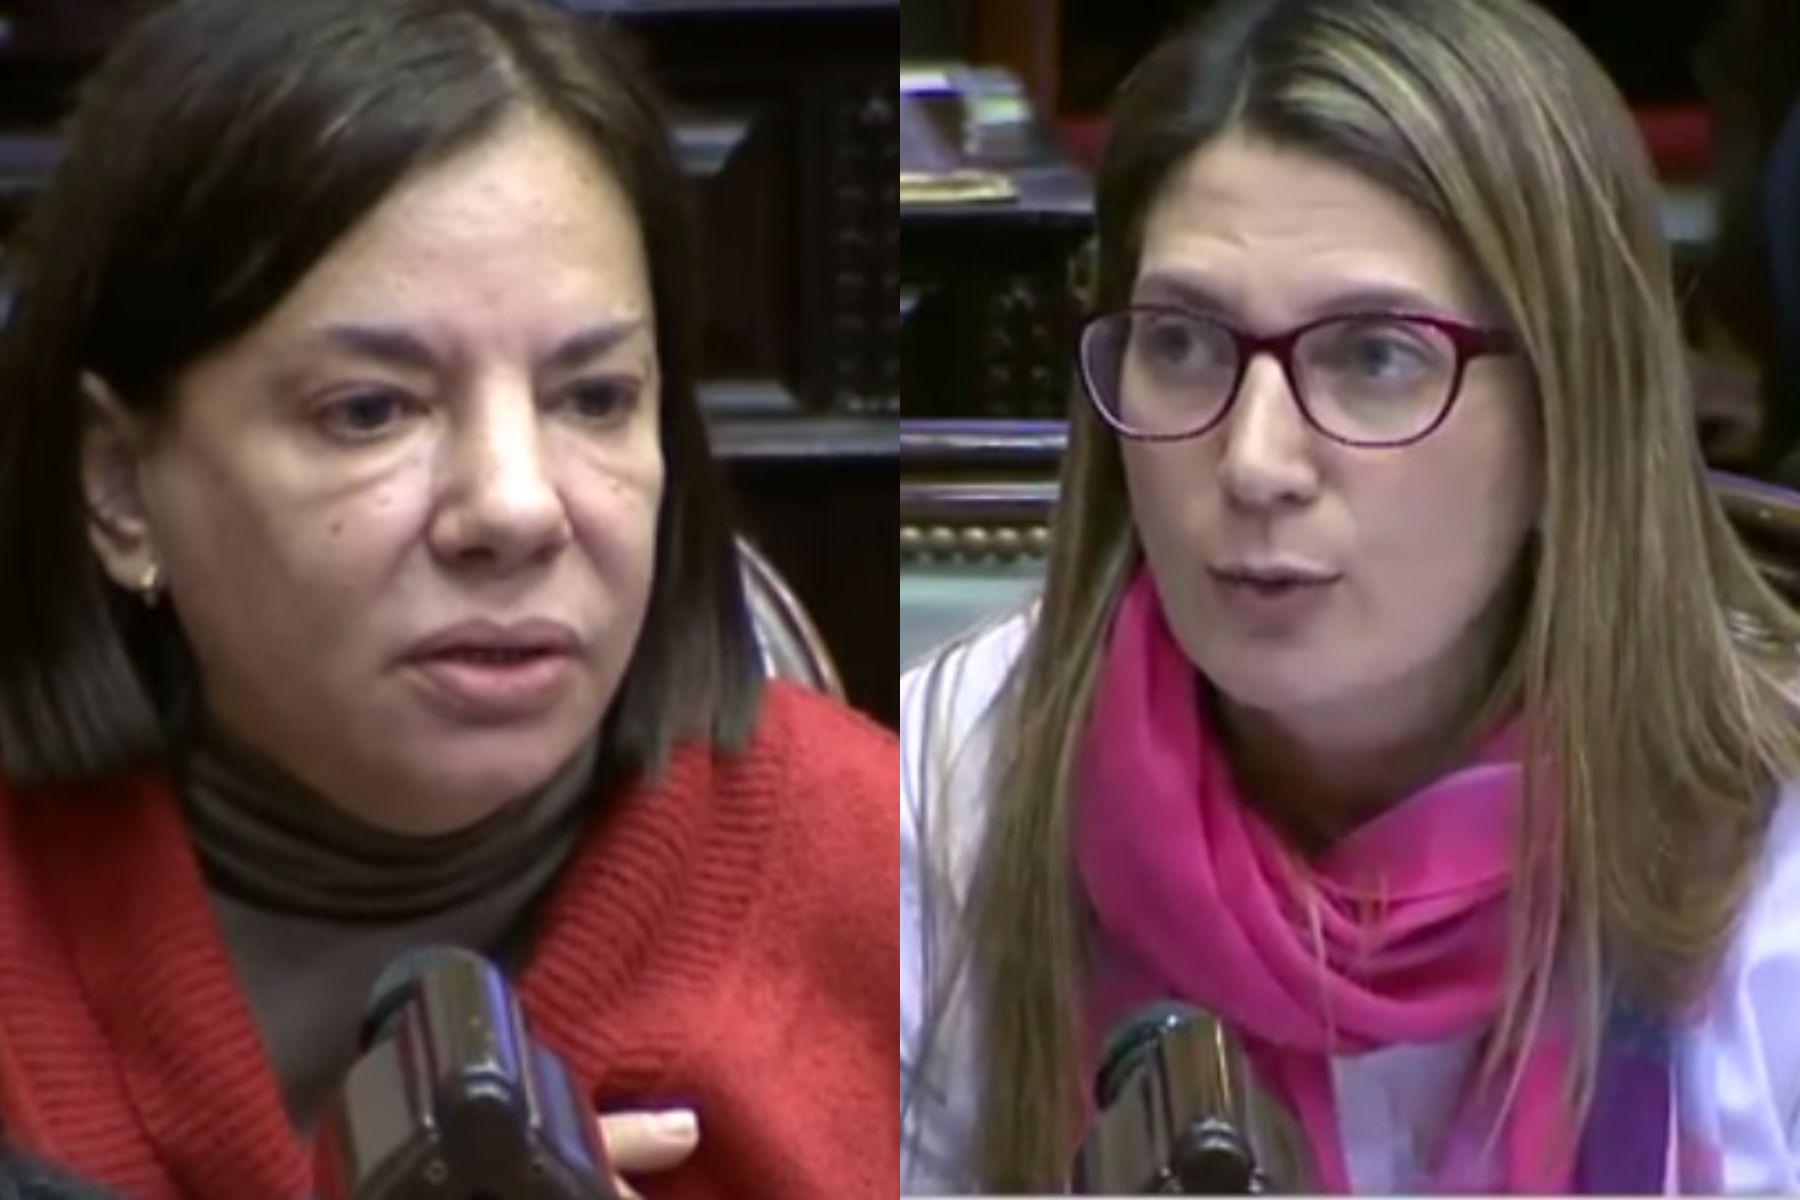 DiputadasSandra Mendoza ySilvia Lospenatto